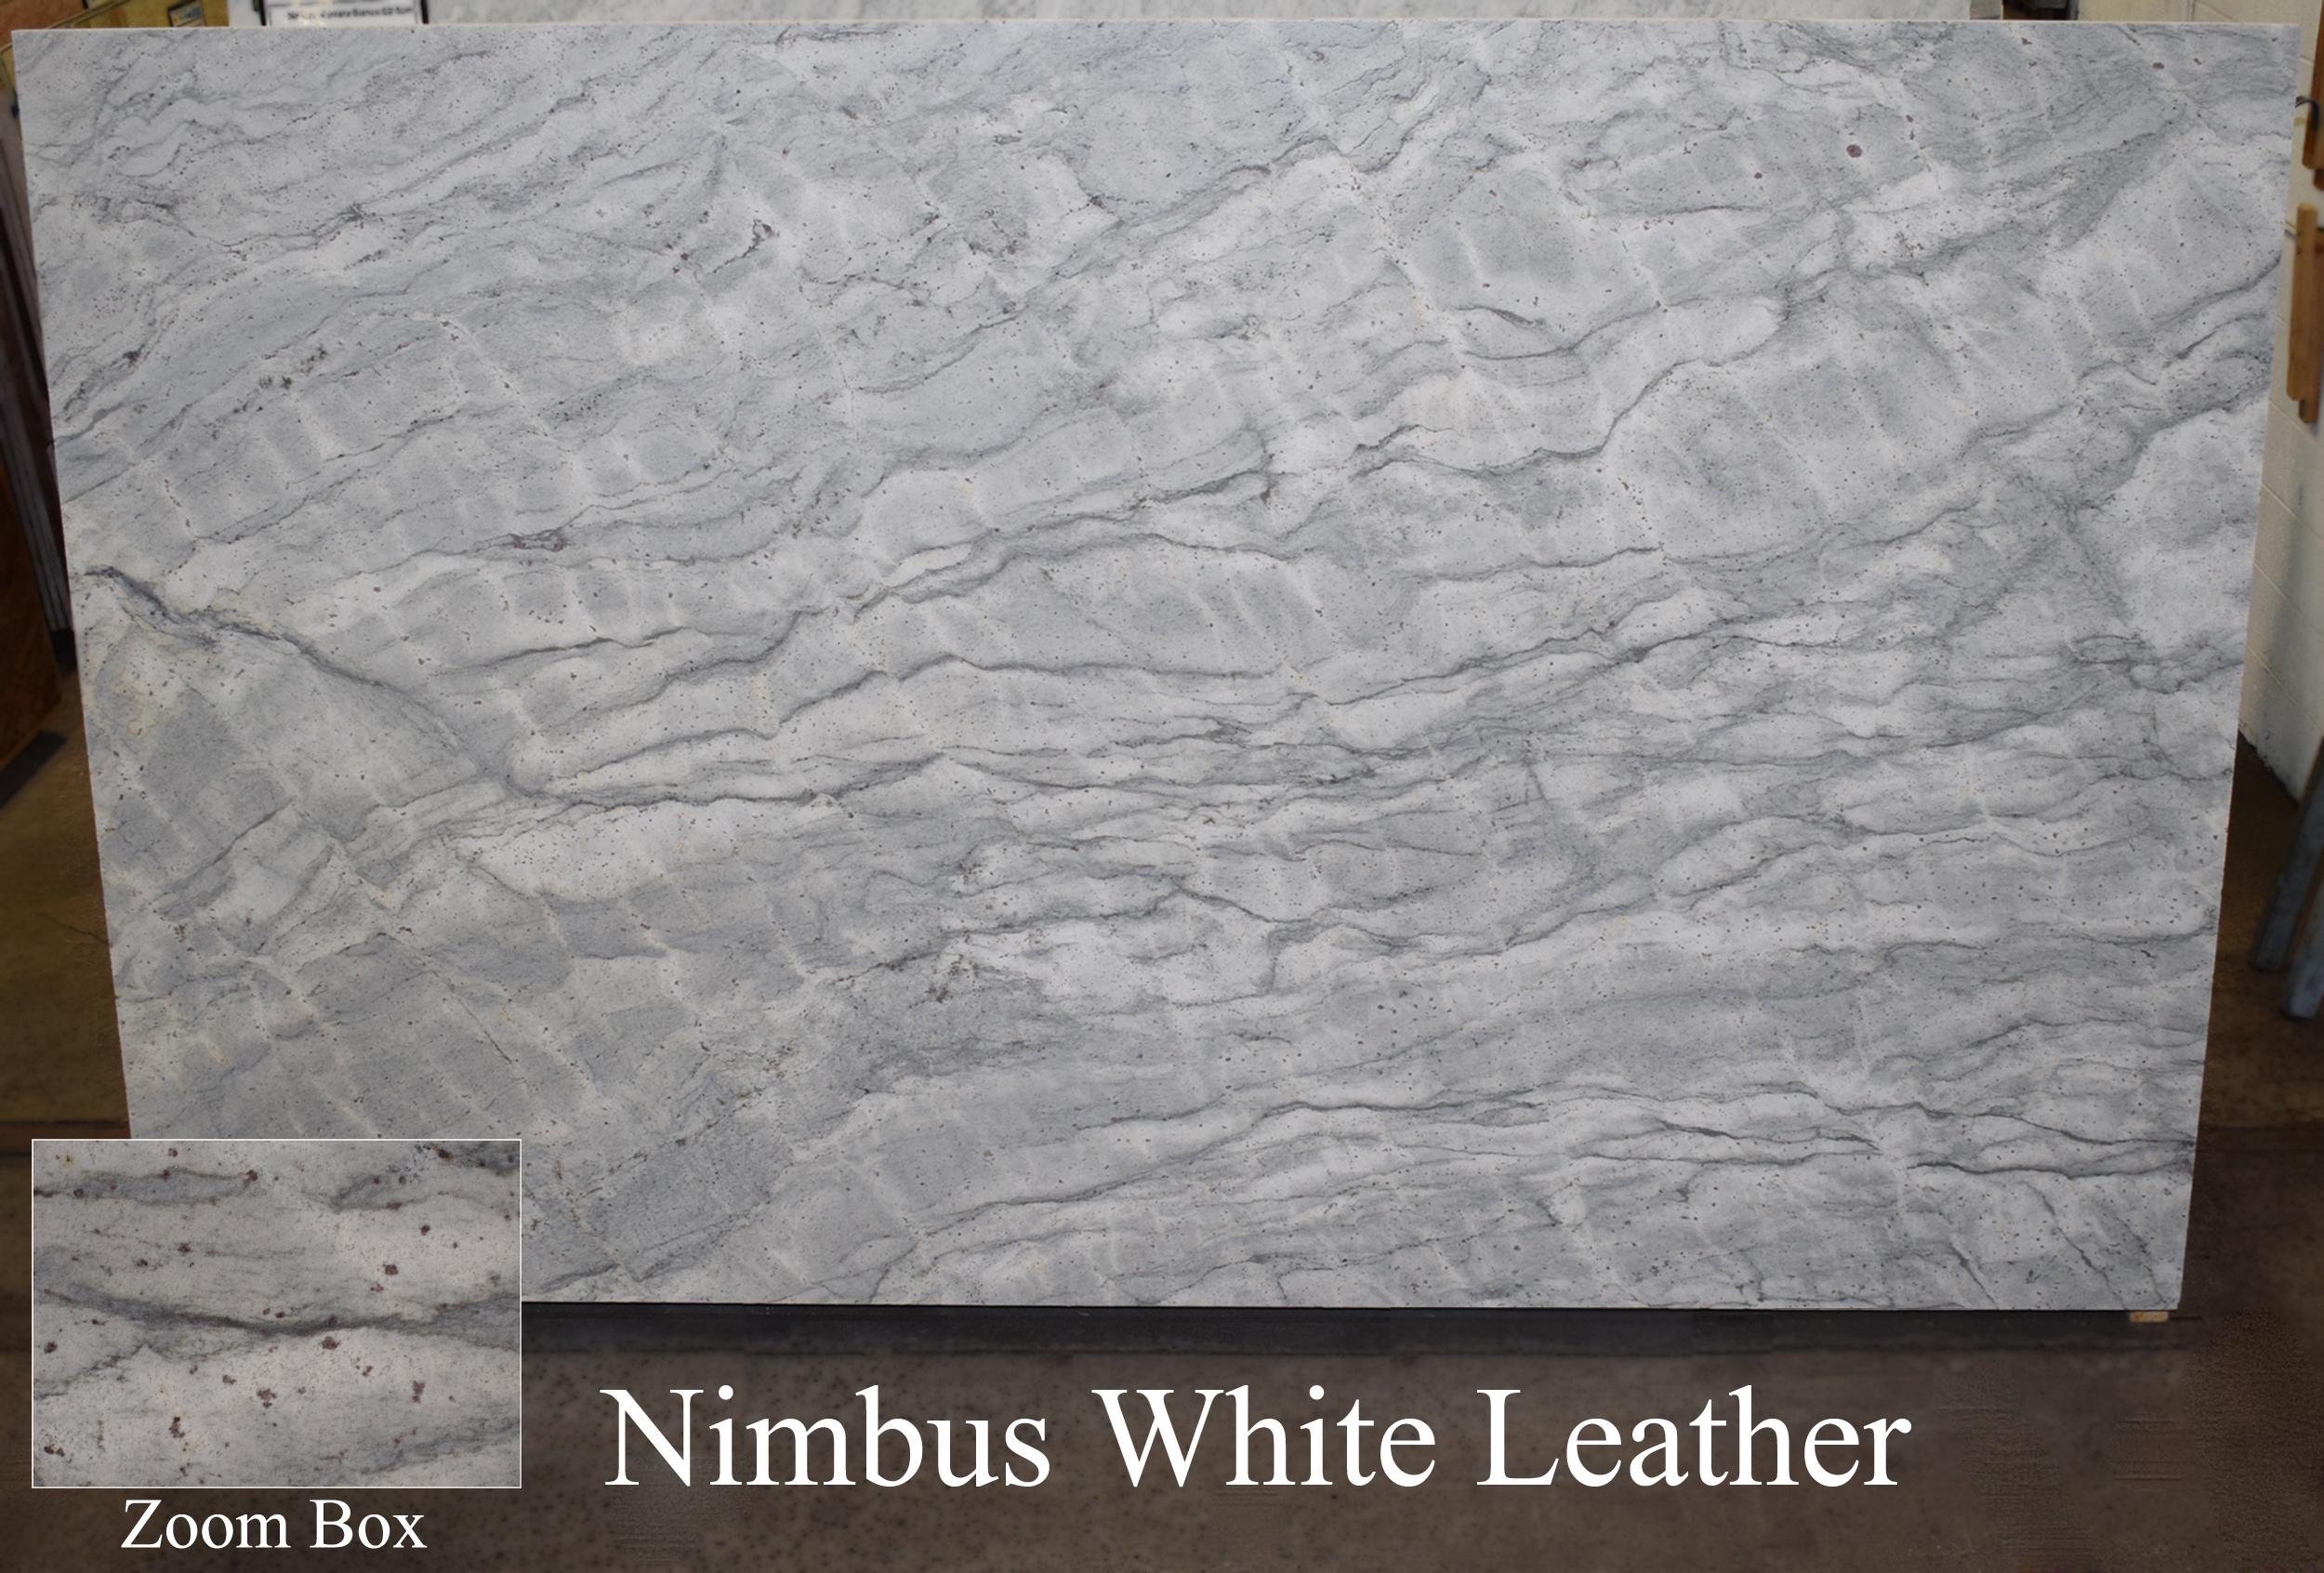 NIMBUS WHITE LEATHER